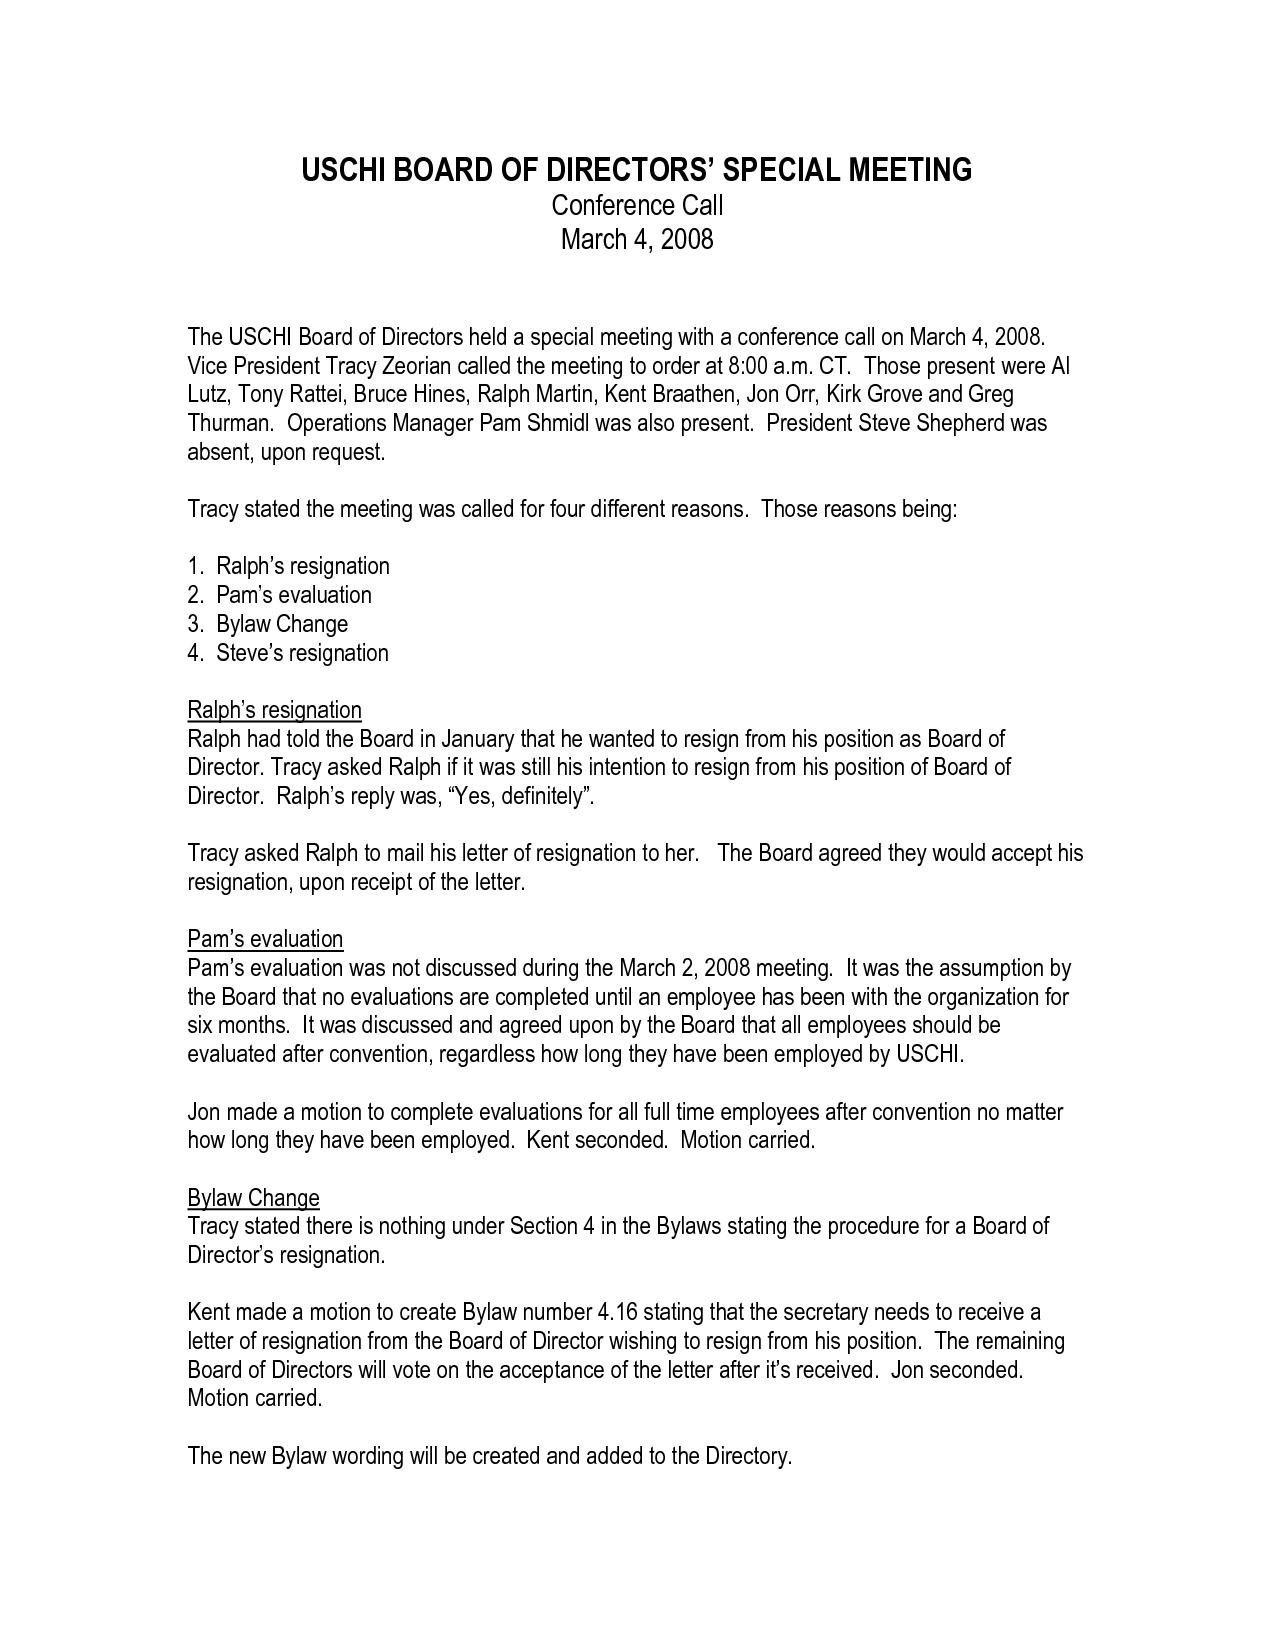 Board Member Resignation Letter Template - Board Member Resignation Letter Template Acurnamedia